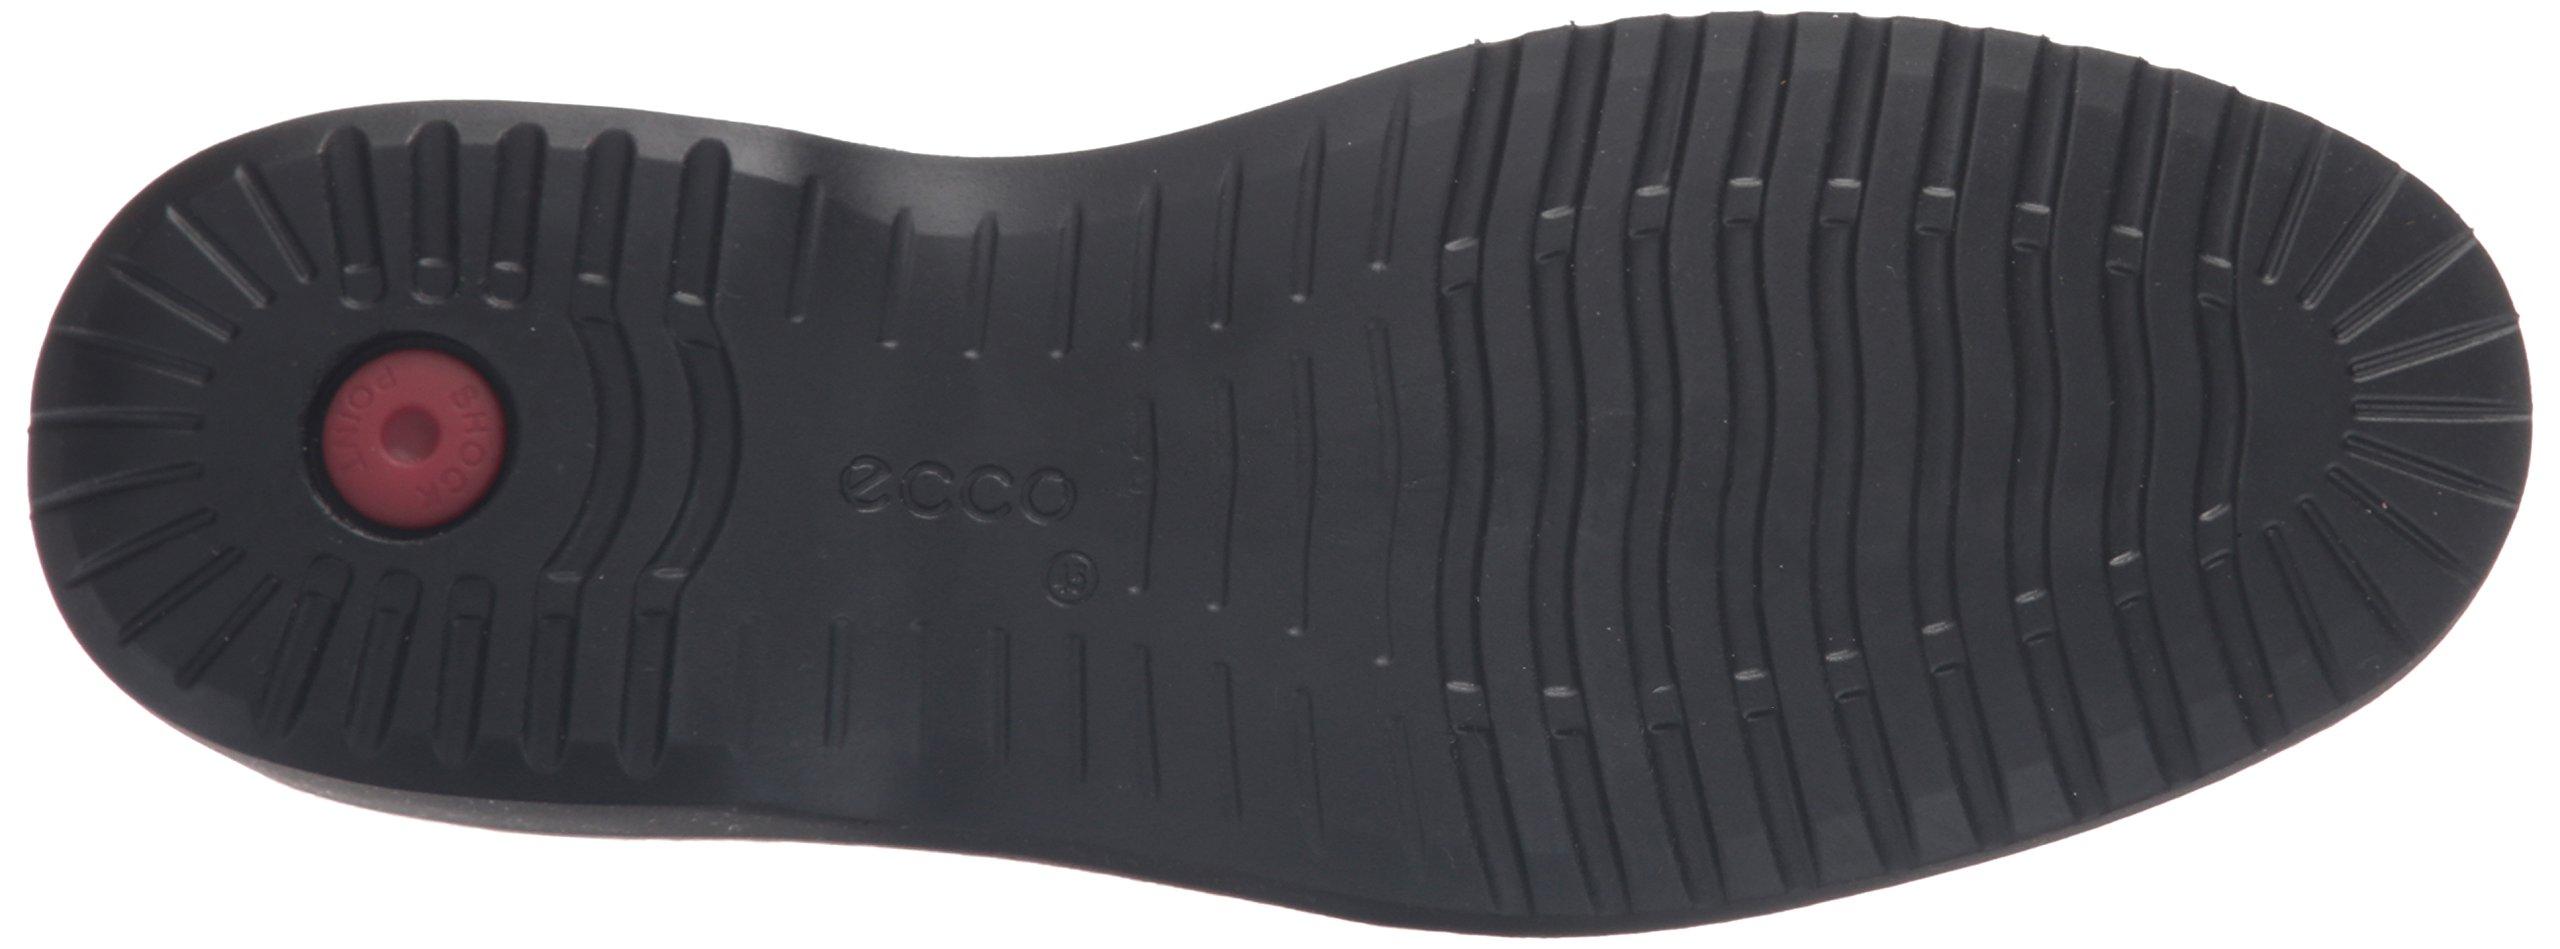 ECCO Men's Ian Chukka Boot, Black, 43 EU/9-9.5 M US by ECCO (Image #3)